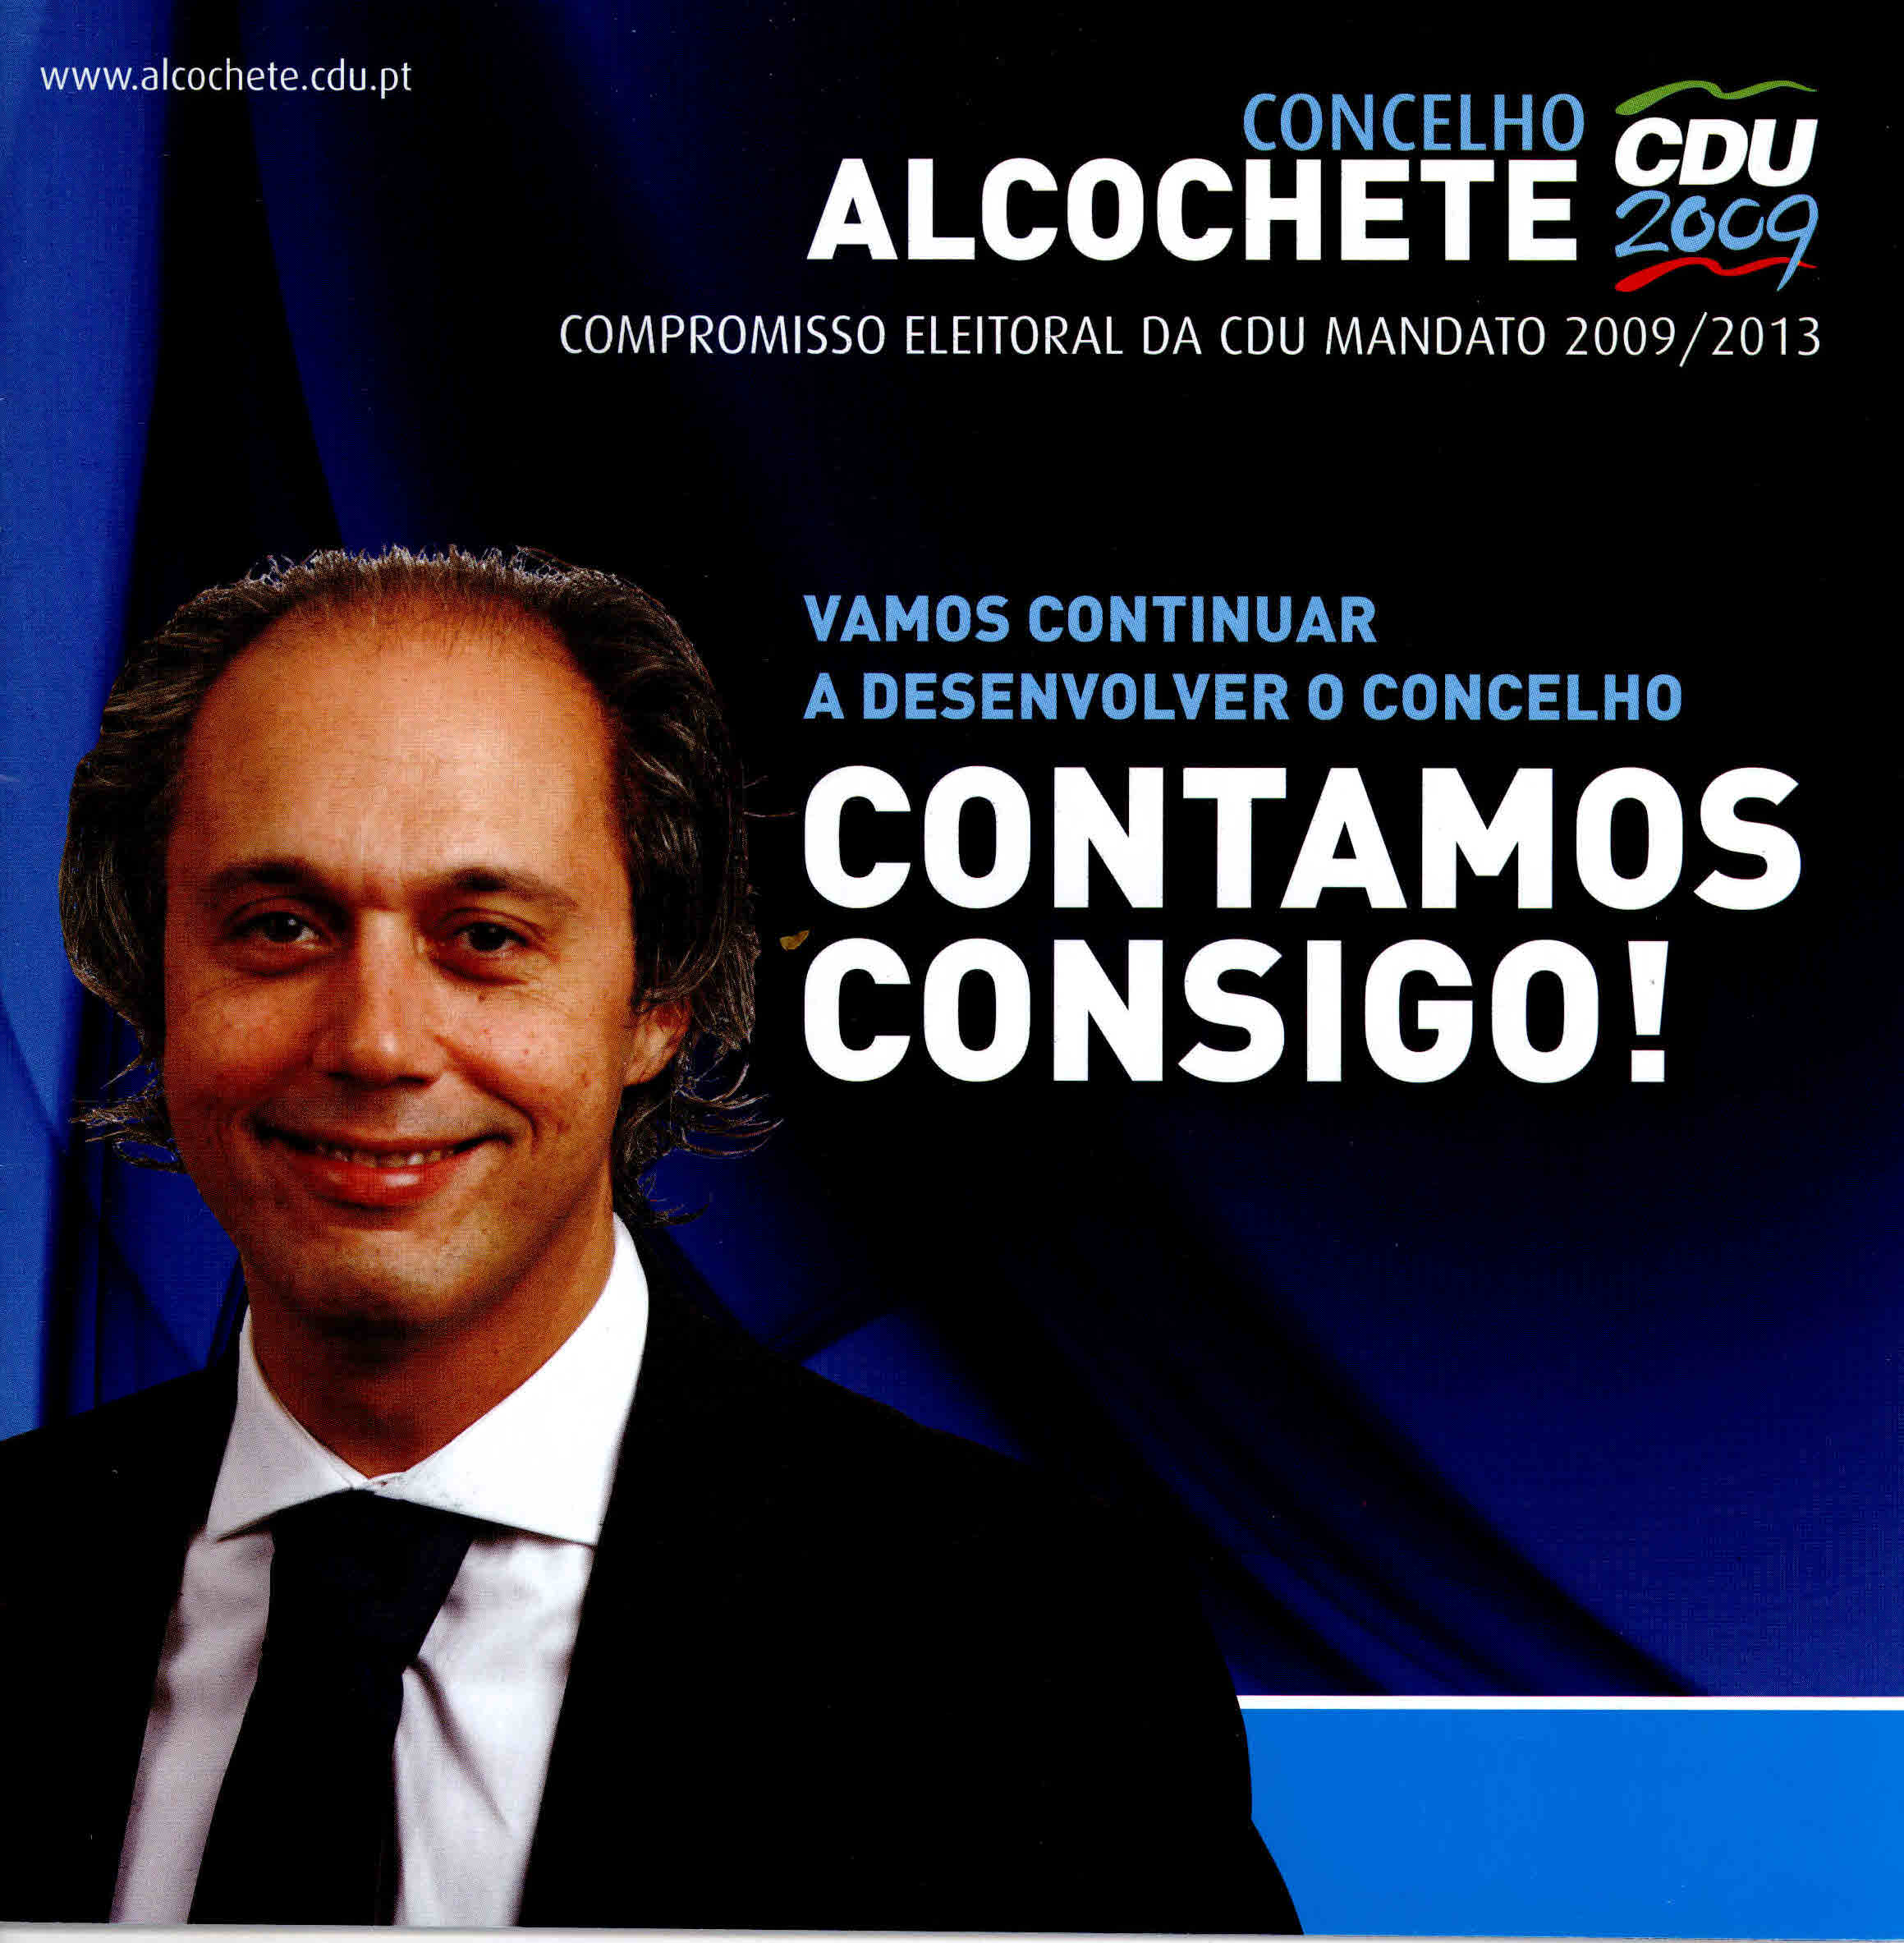 Copy of Alcochete1 – CDU